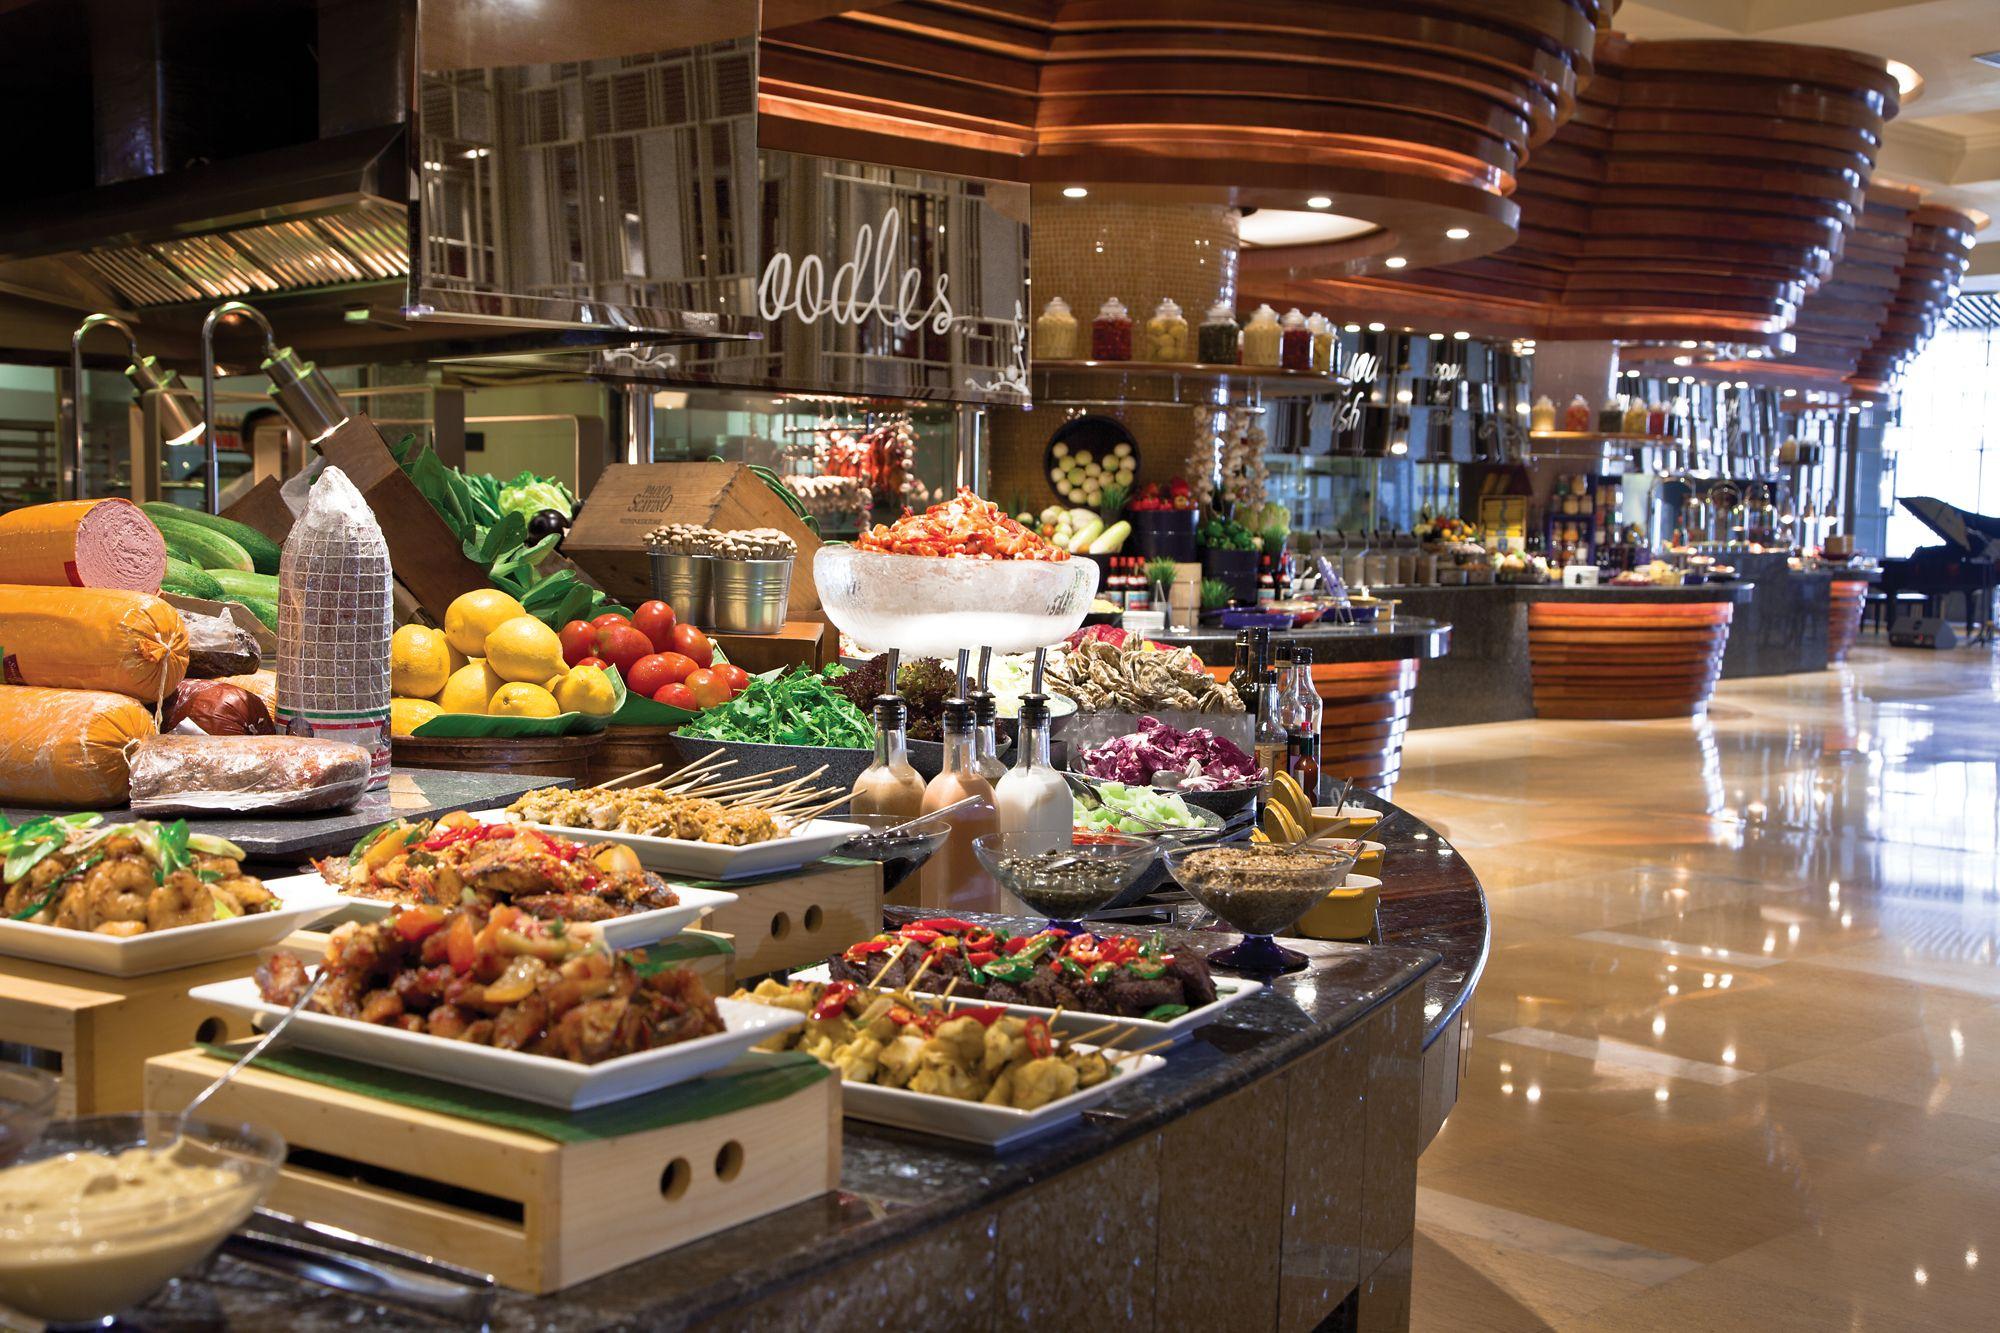 5 Kartu Kredit Untuk Promo Dining Buffet Di Hotel Sepuasnya